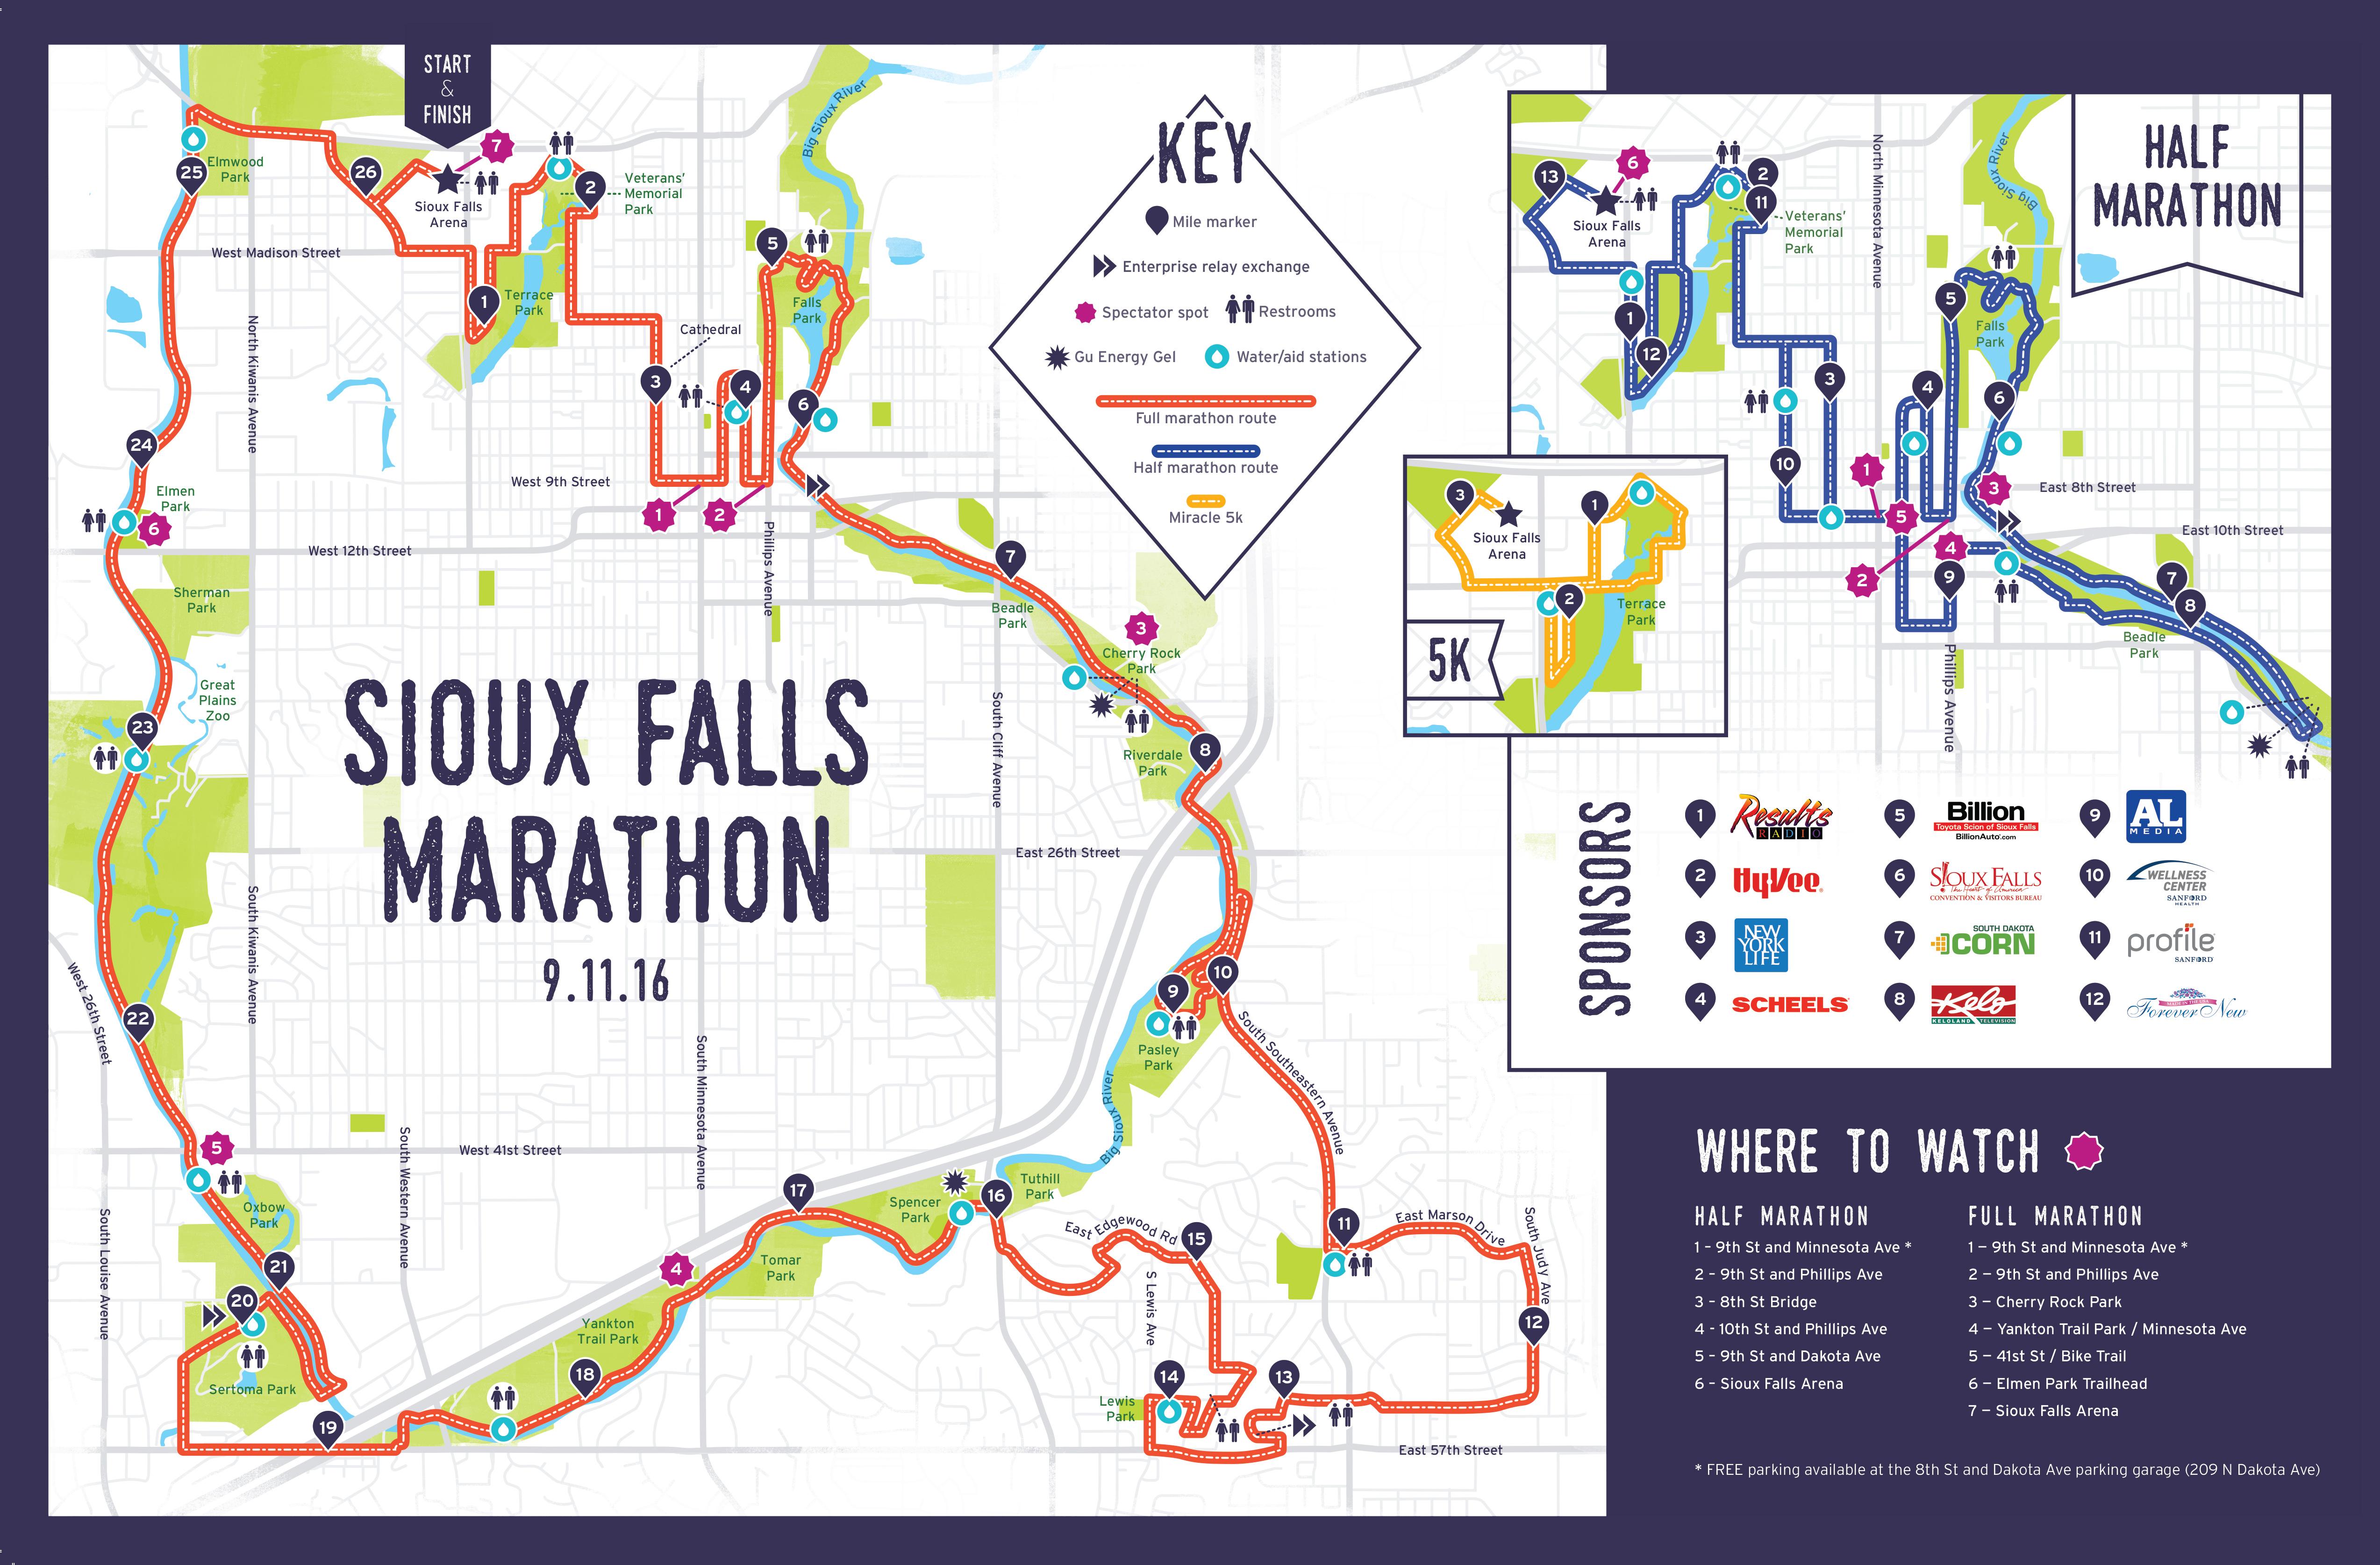 Sioux Falls Marathon Route Map